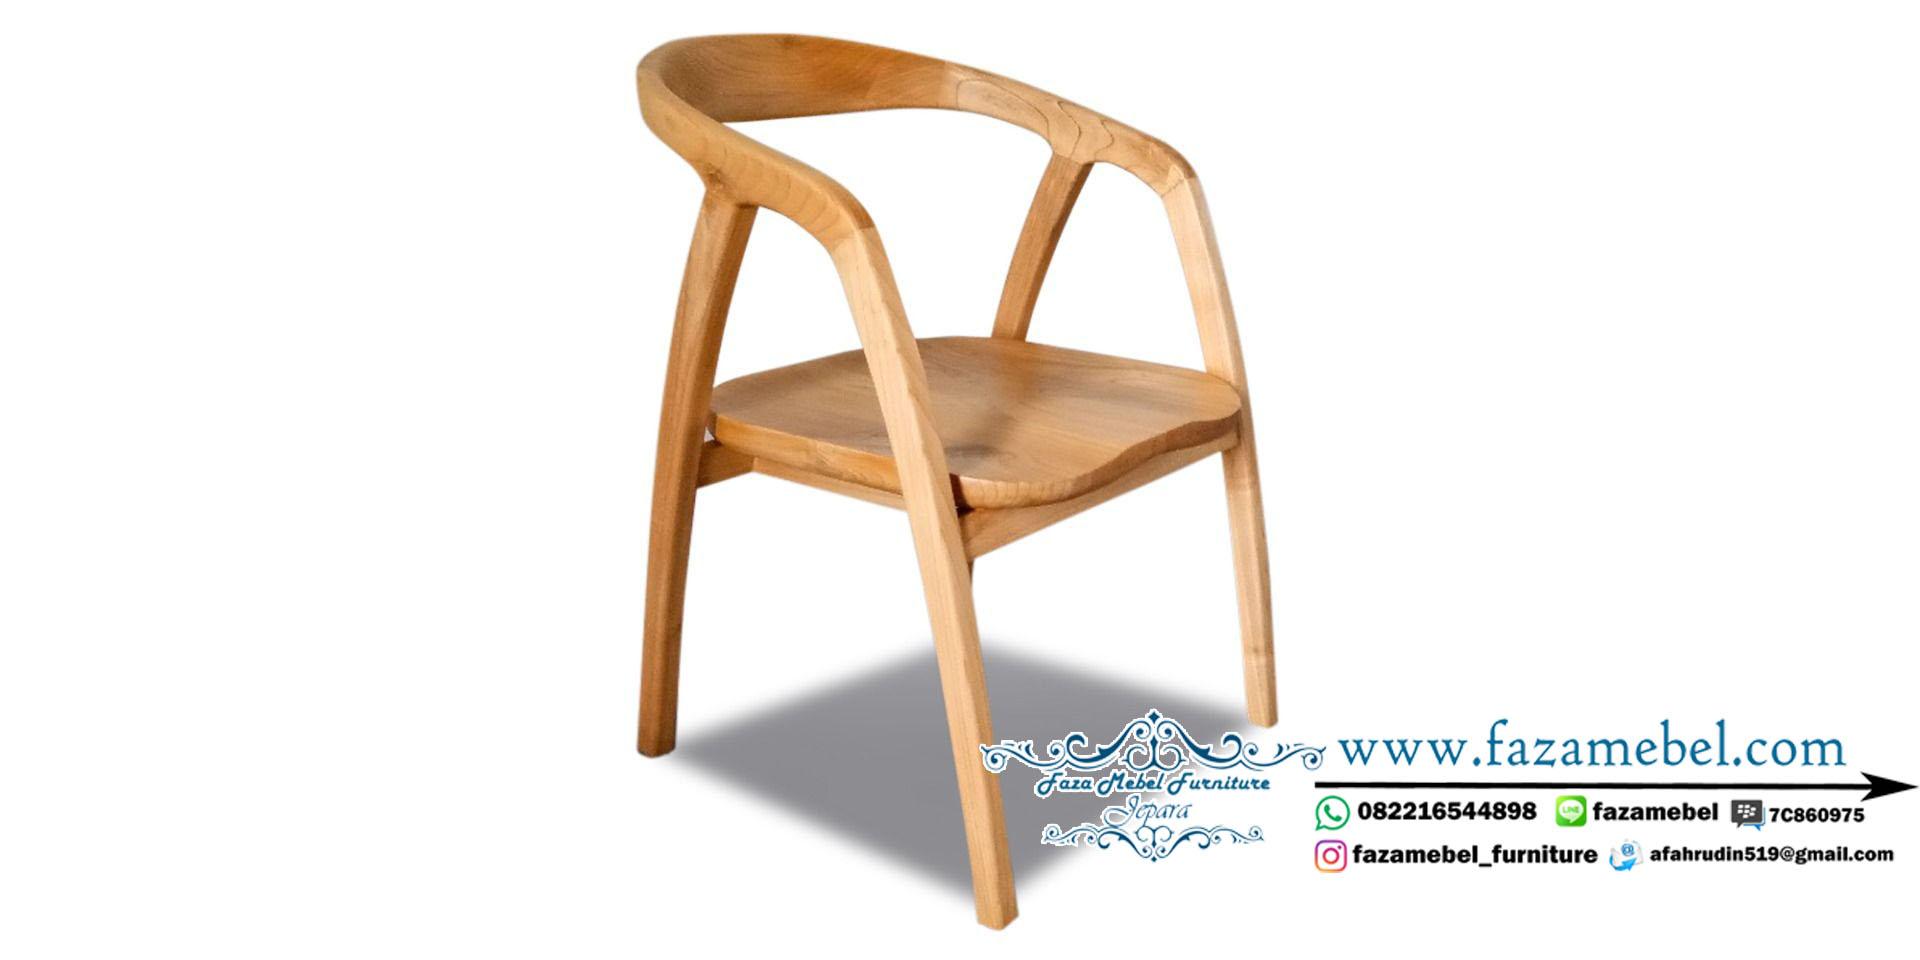 kursi-makan-kayu-minimalis-terbaru